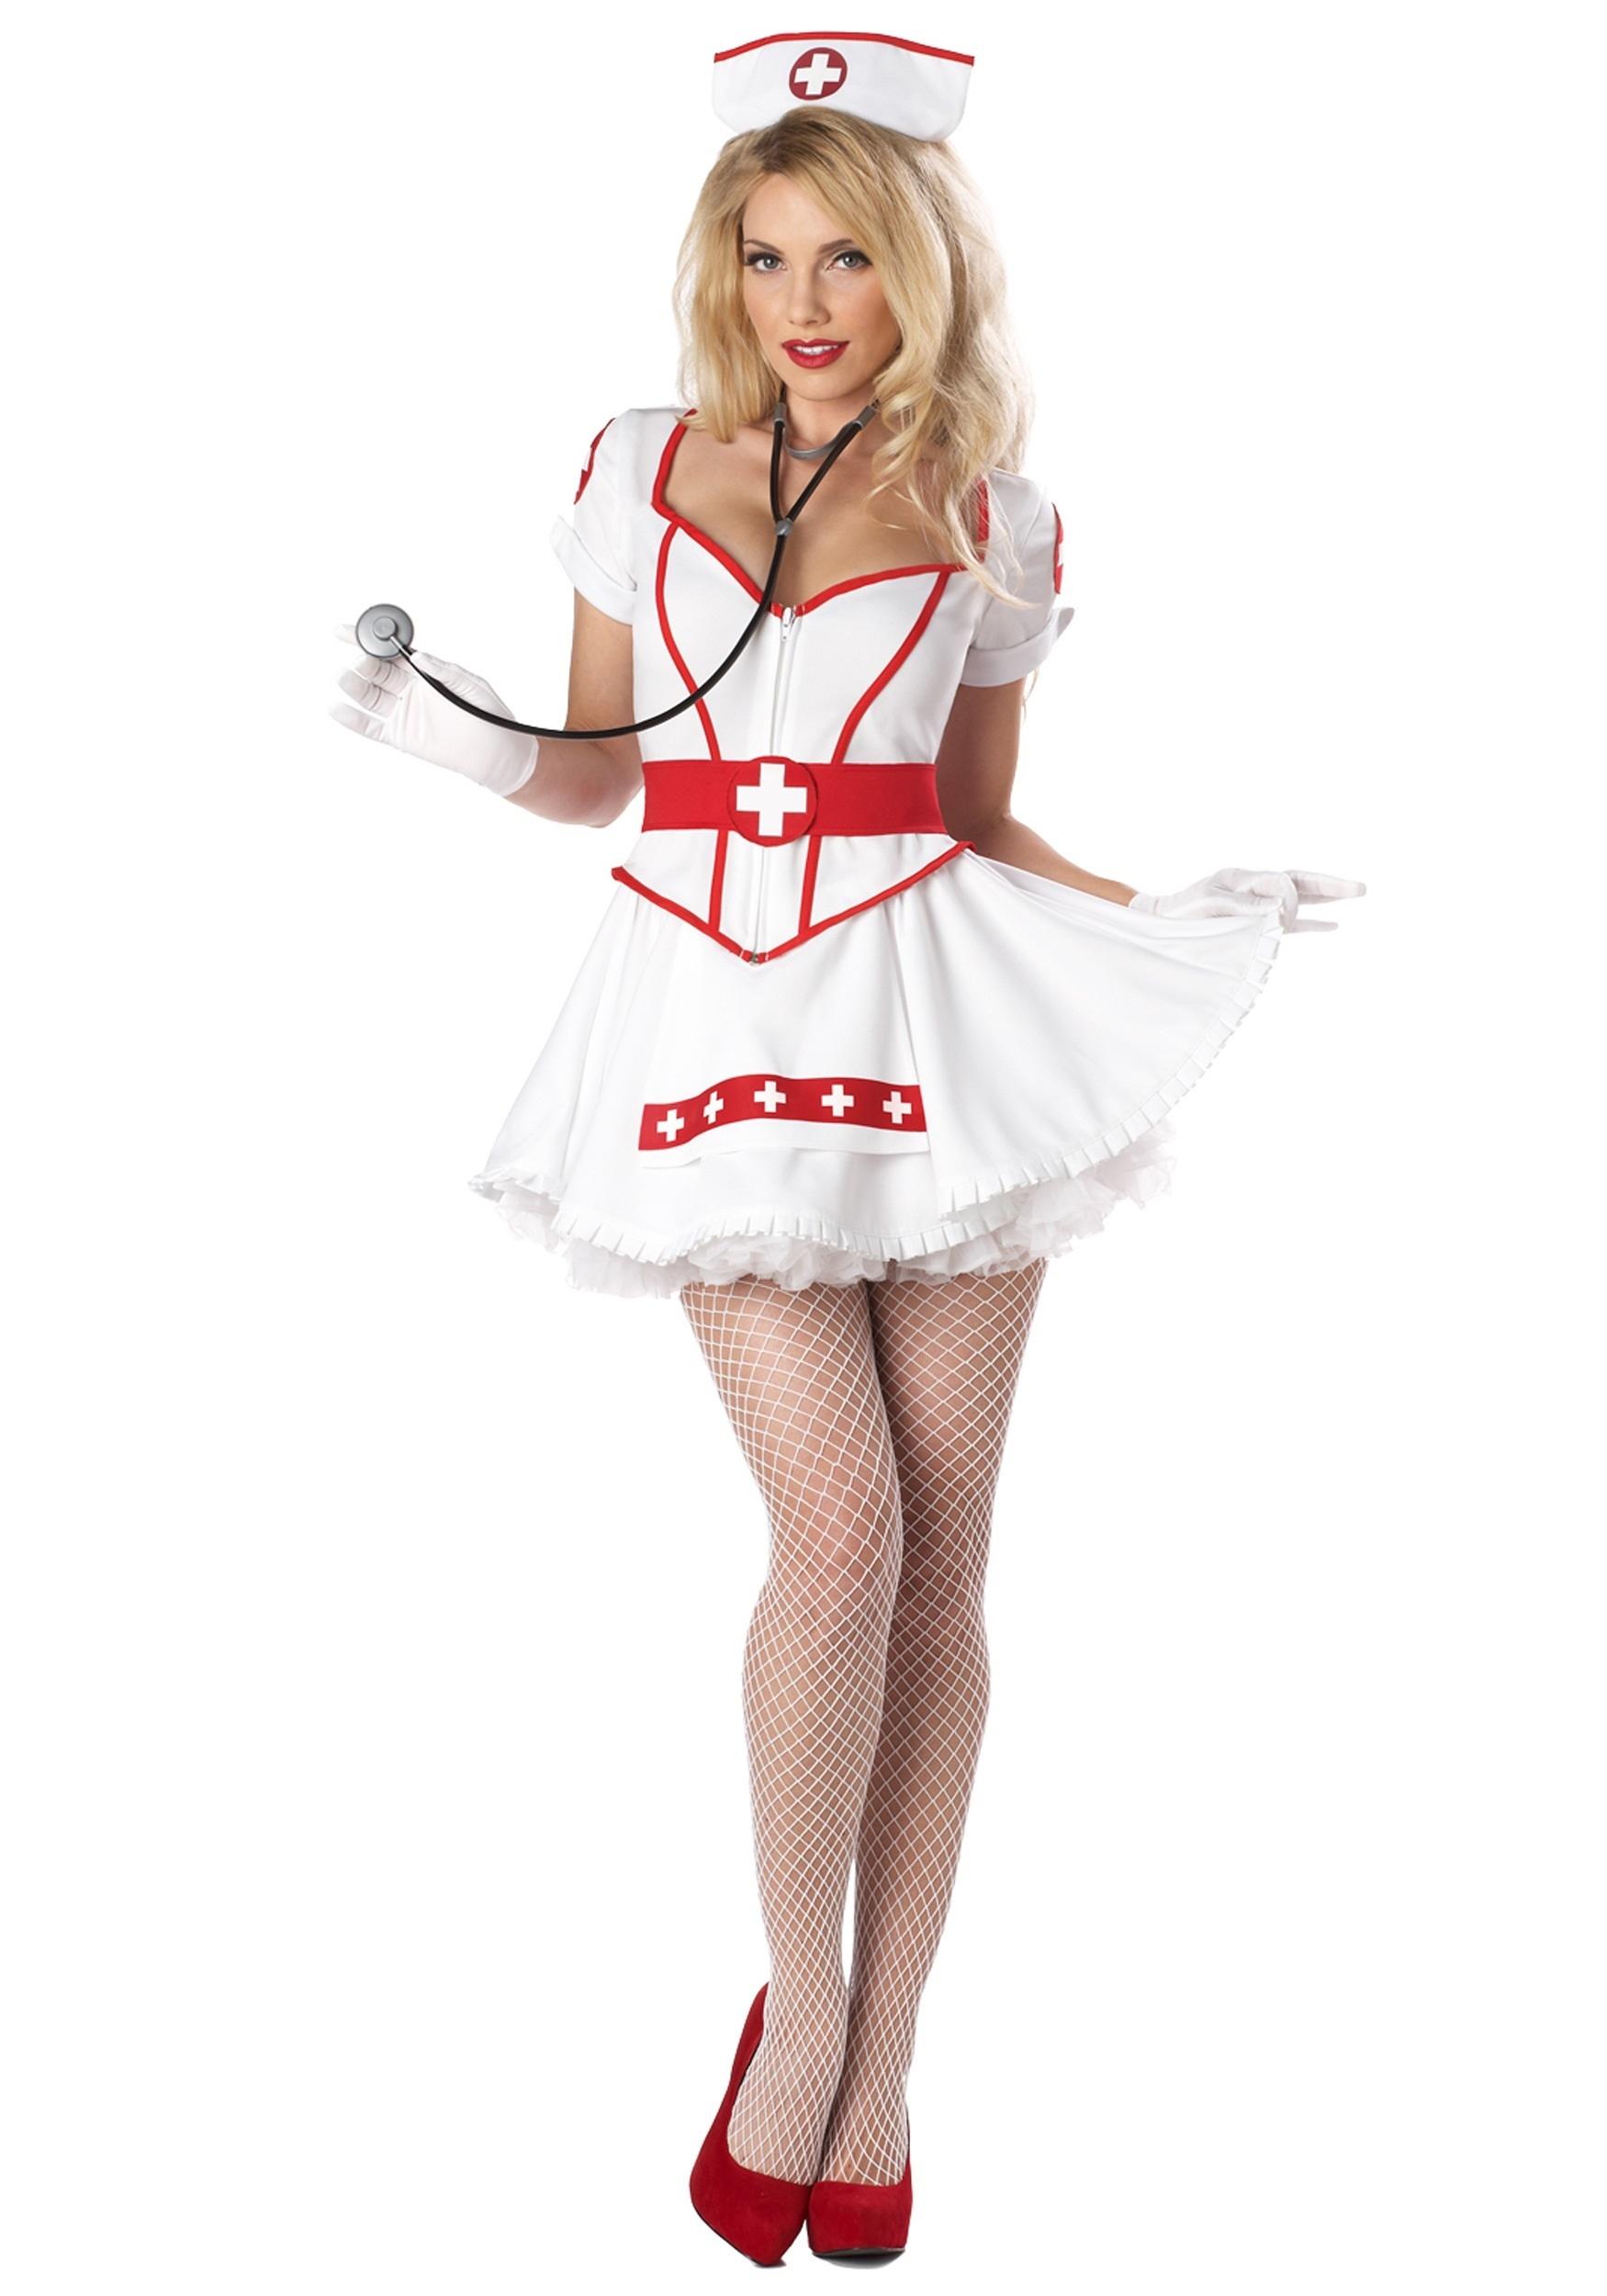 How to make a sexy nurse costume